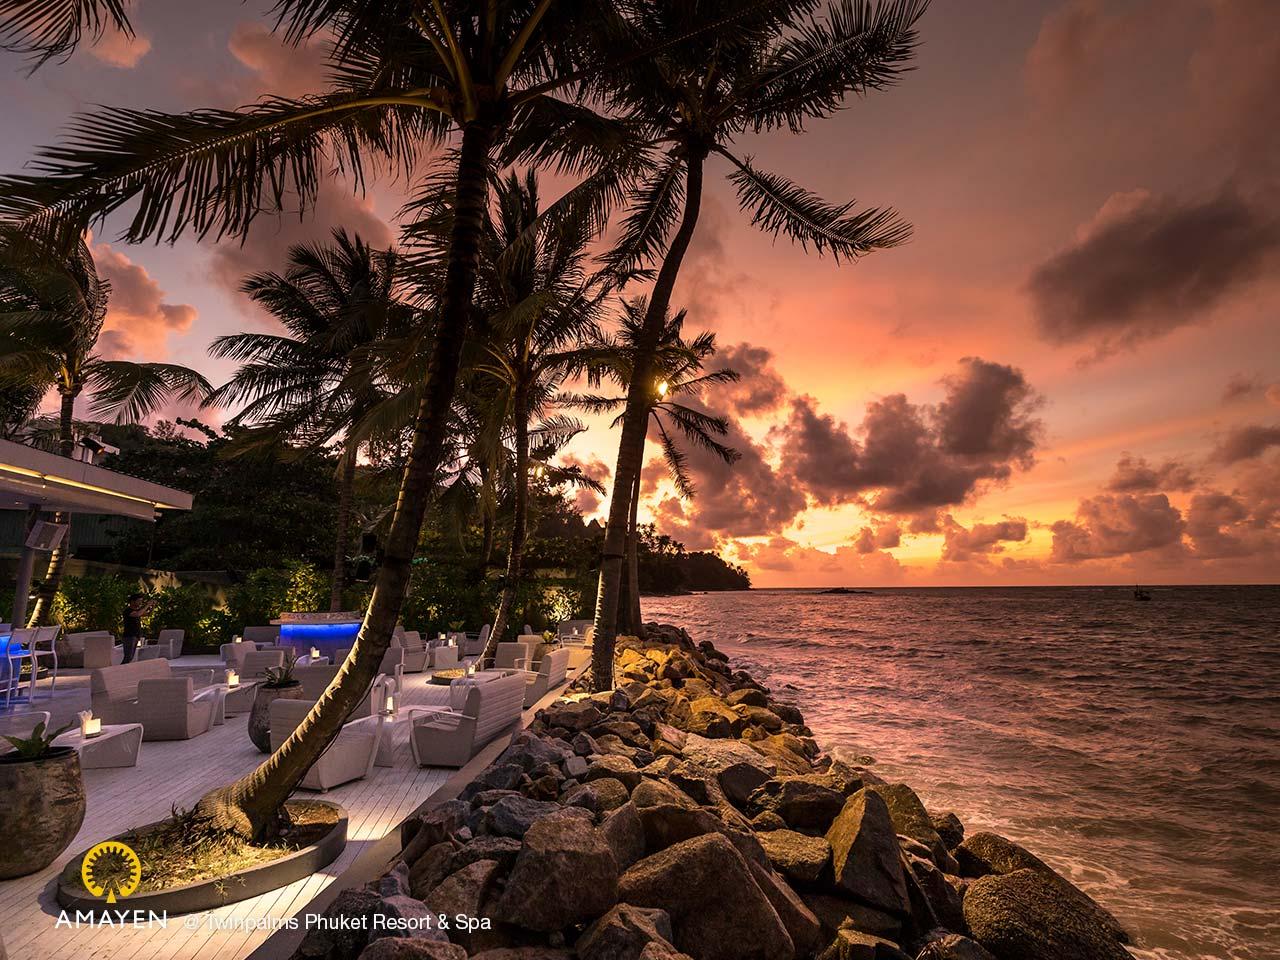 Luxury Meditation and Yoga Retreats in Phuket, Thailand